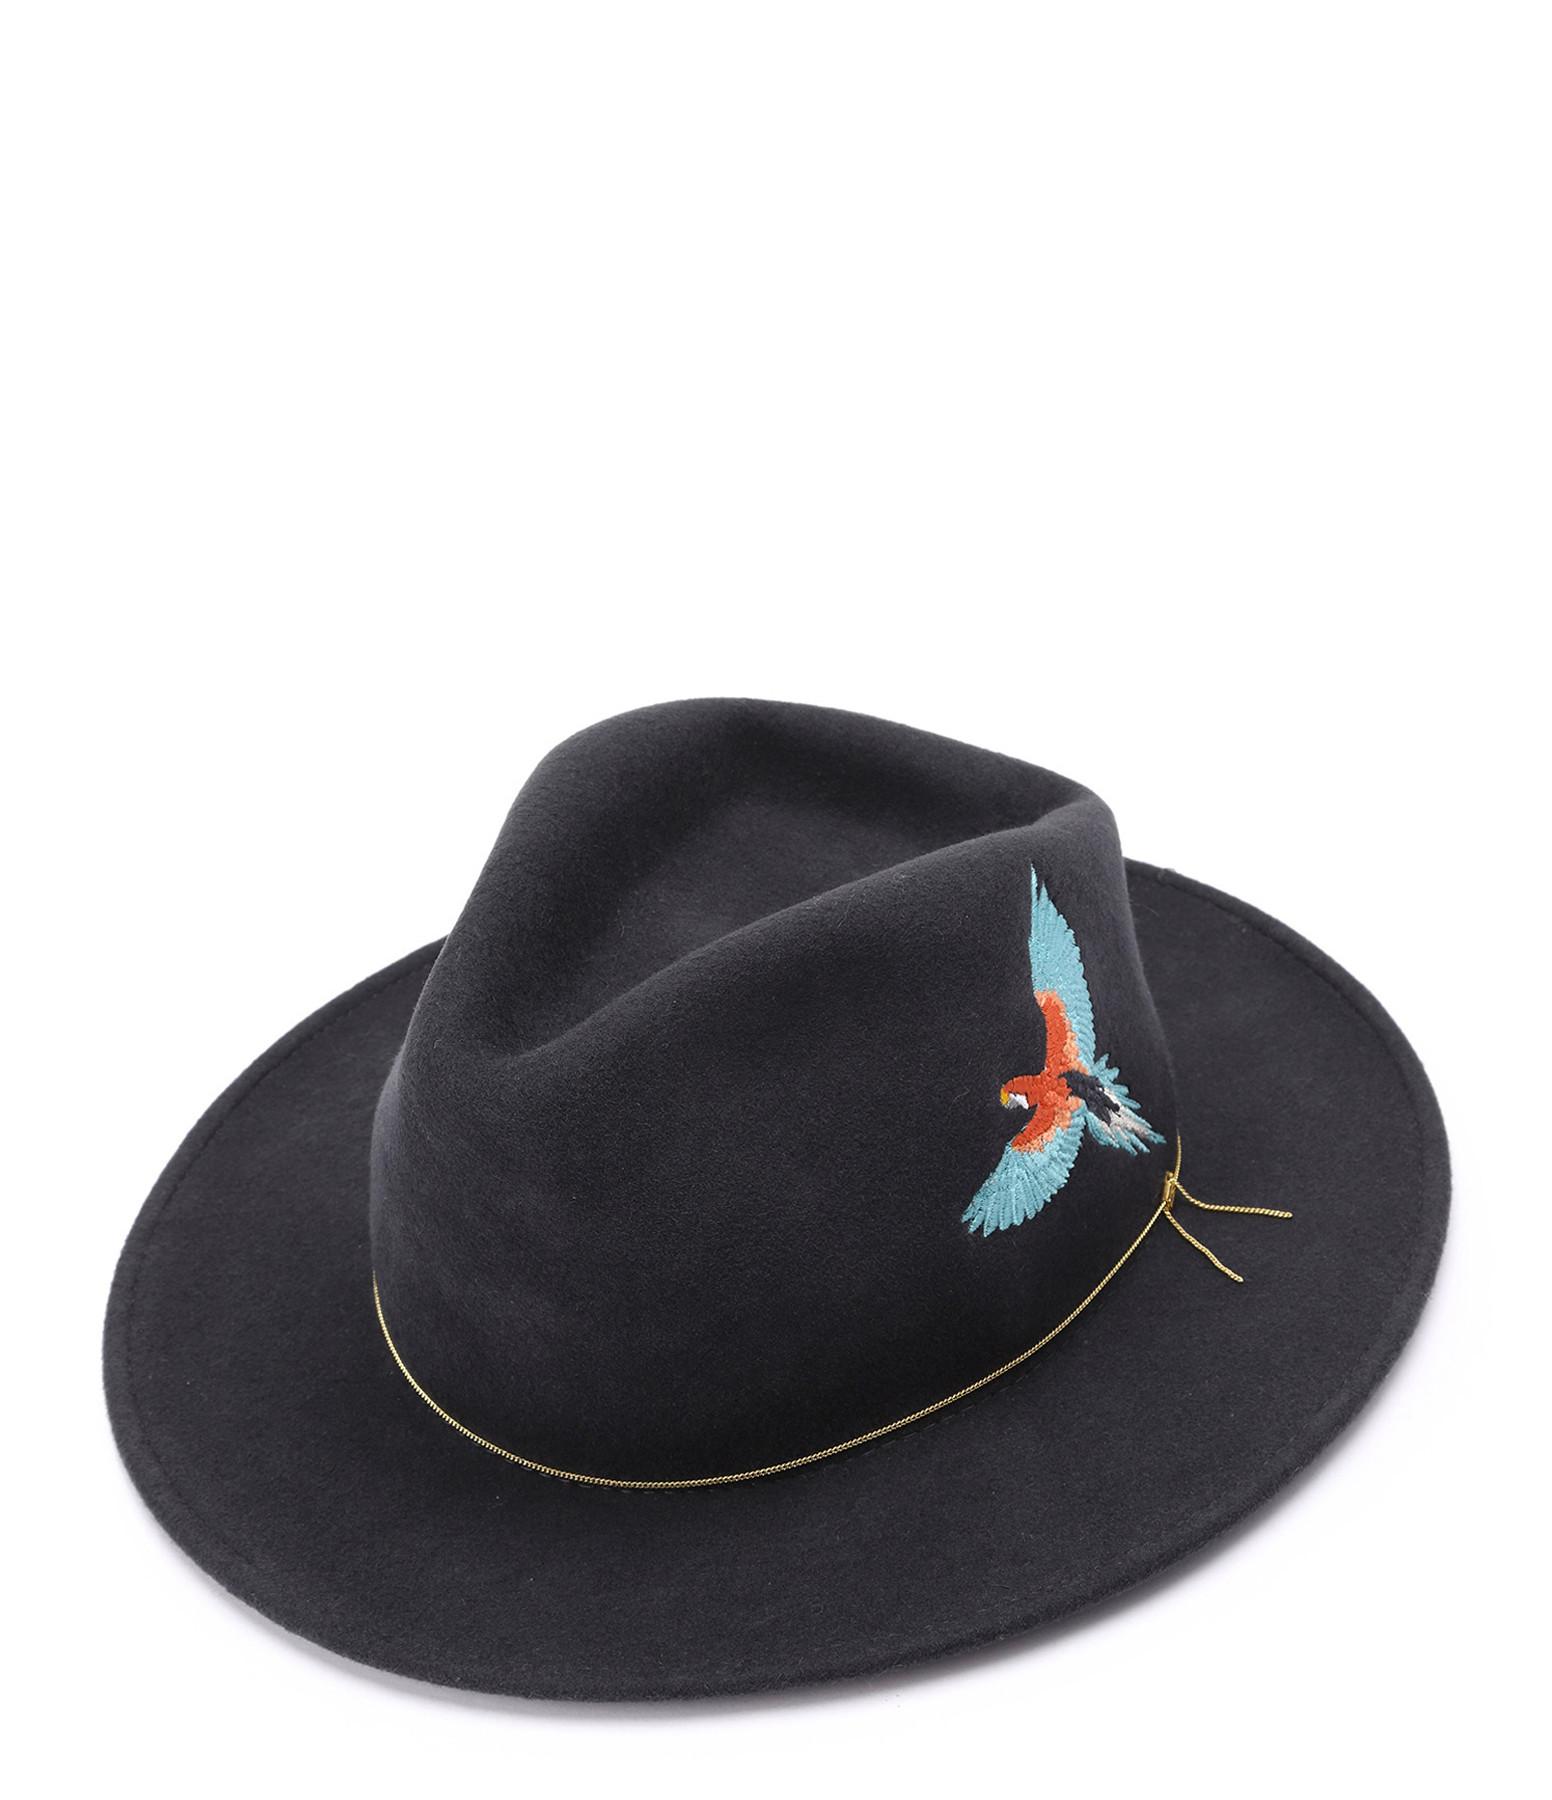 VAN PALMA - Chapeau The Dakota Laine Gris Turquoise